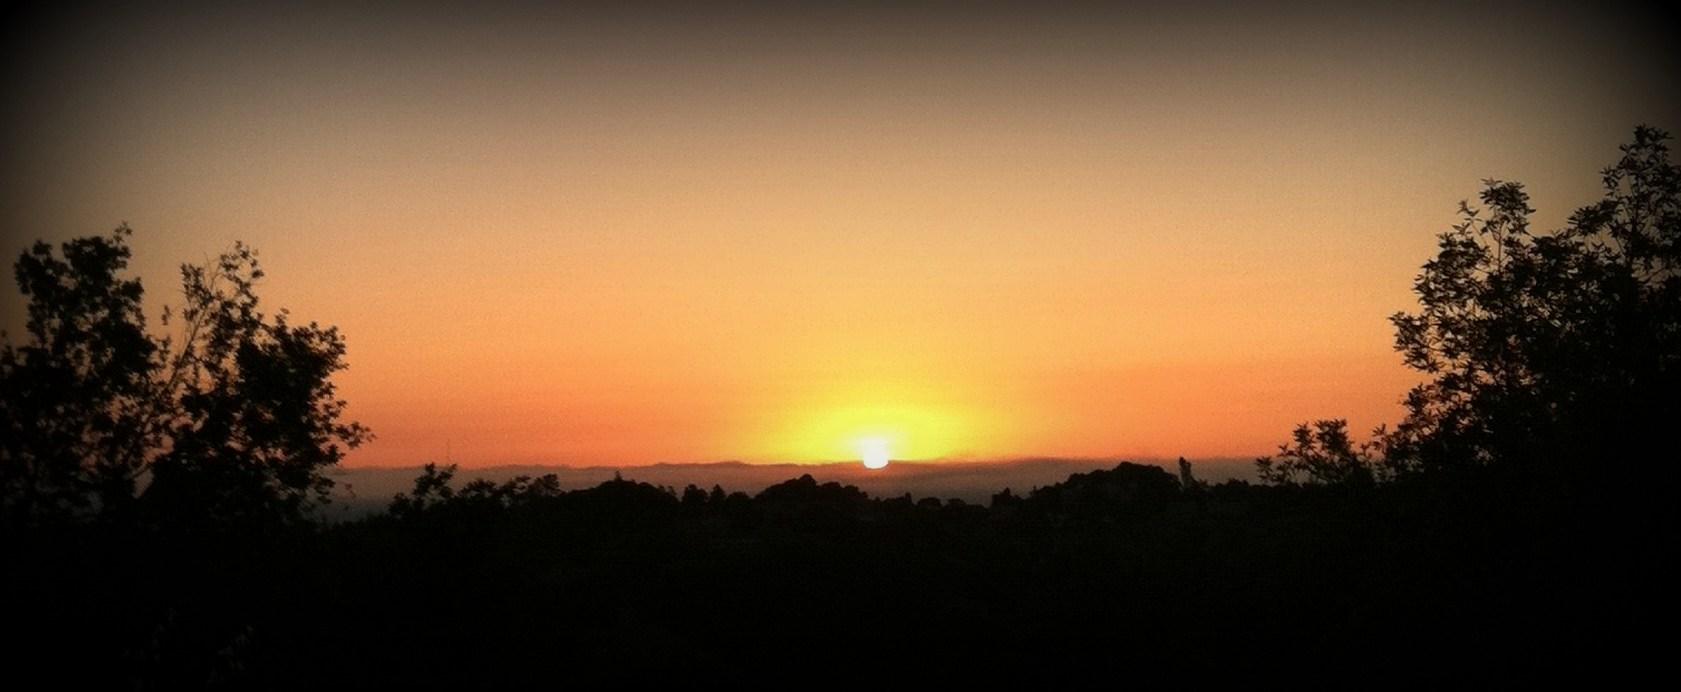 Sunrise by Michael